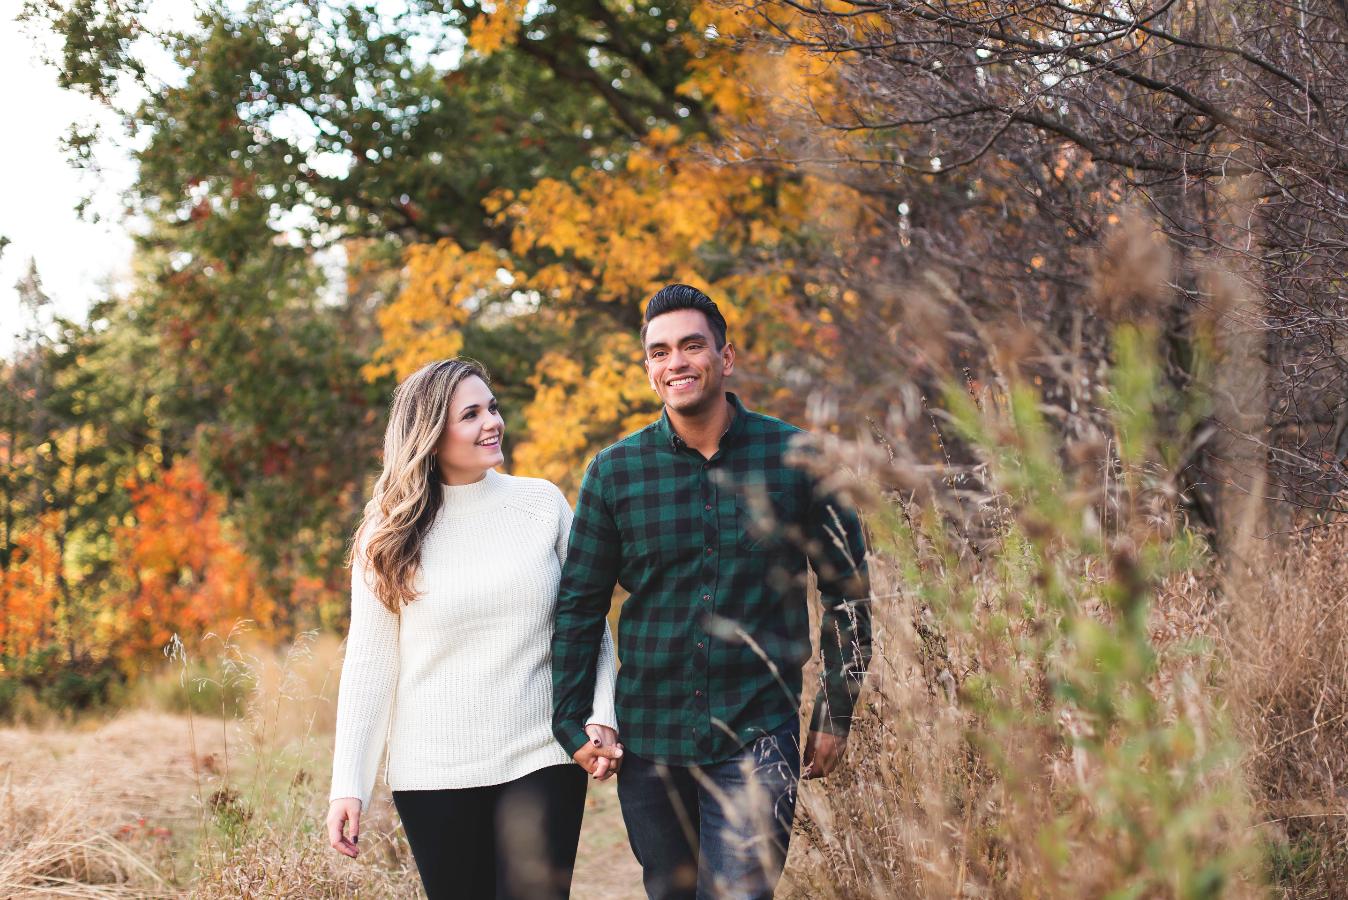 Engagement-Photography-Bruce-Trail-Rain-Hamilton-Burlington-Oakville-Niagara-Toronto-Wedding-Photographer-Photo-Image-1.png